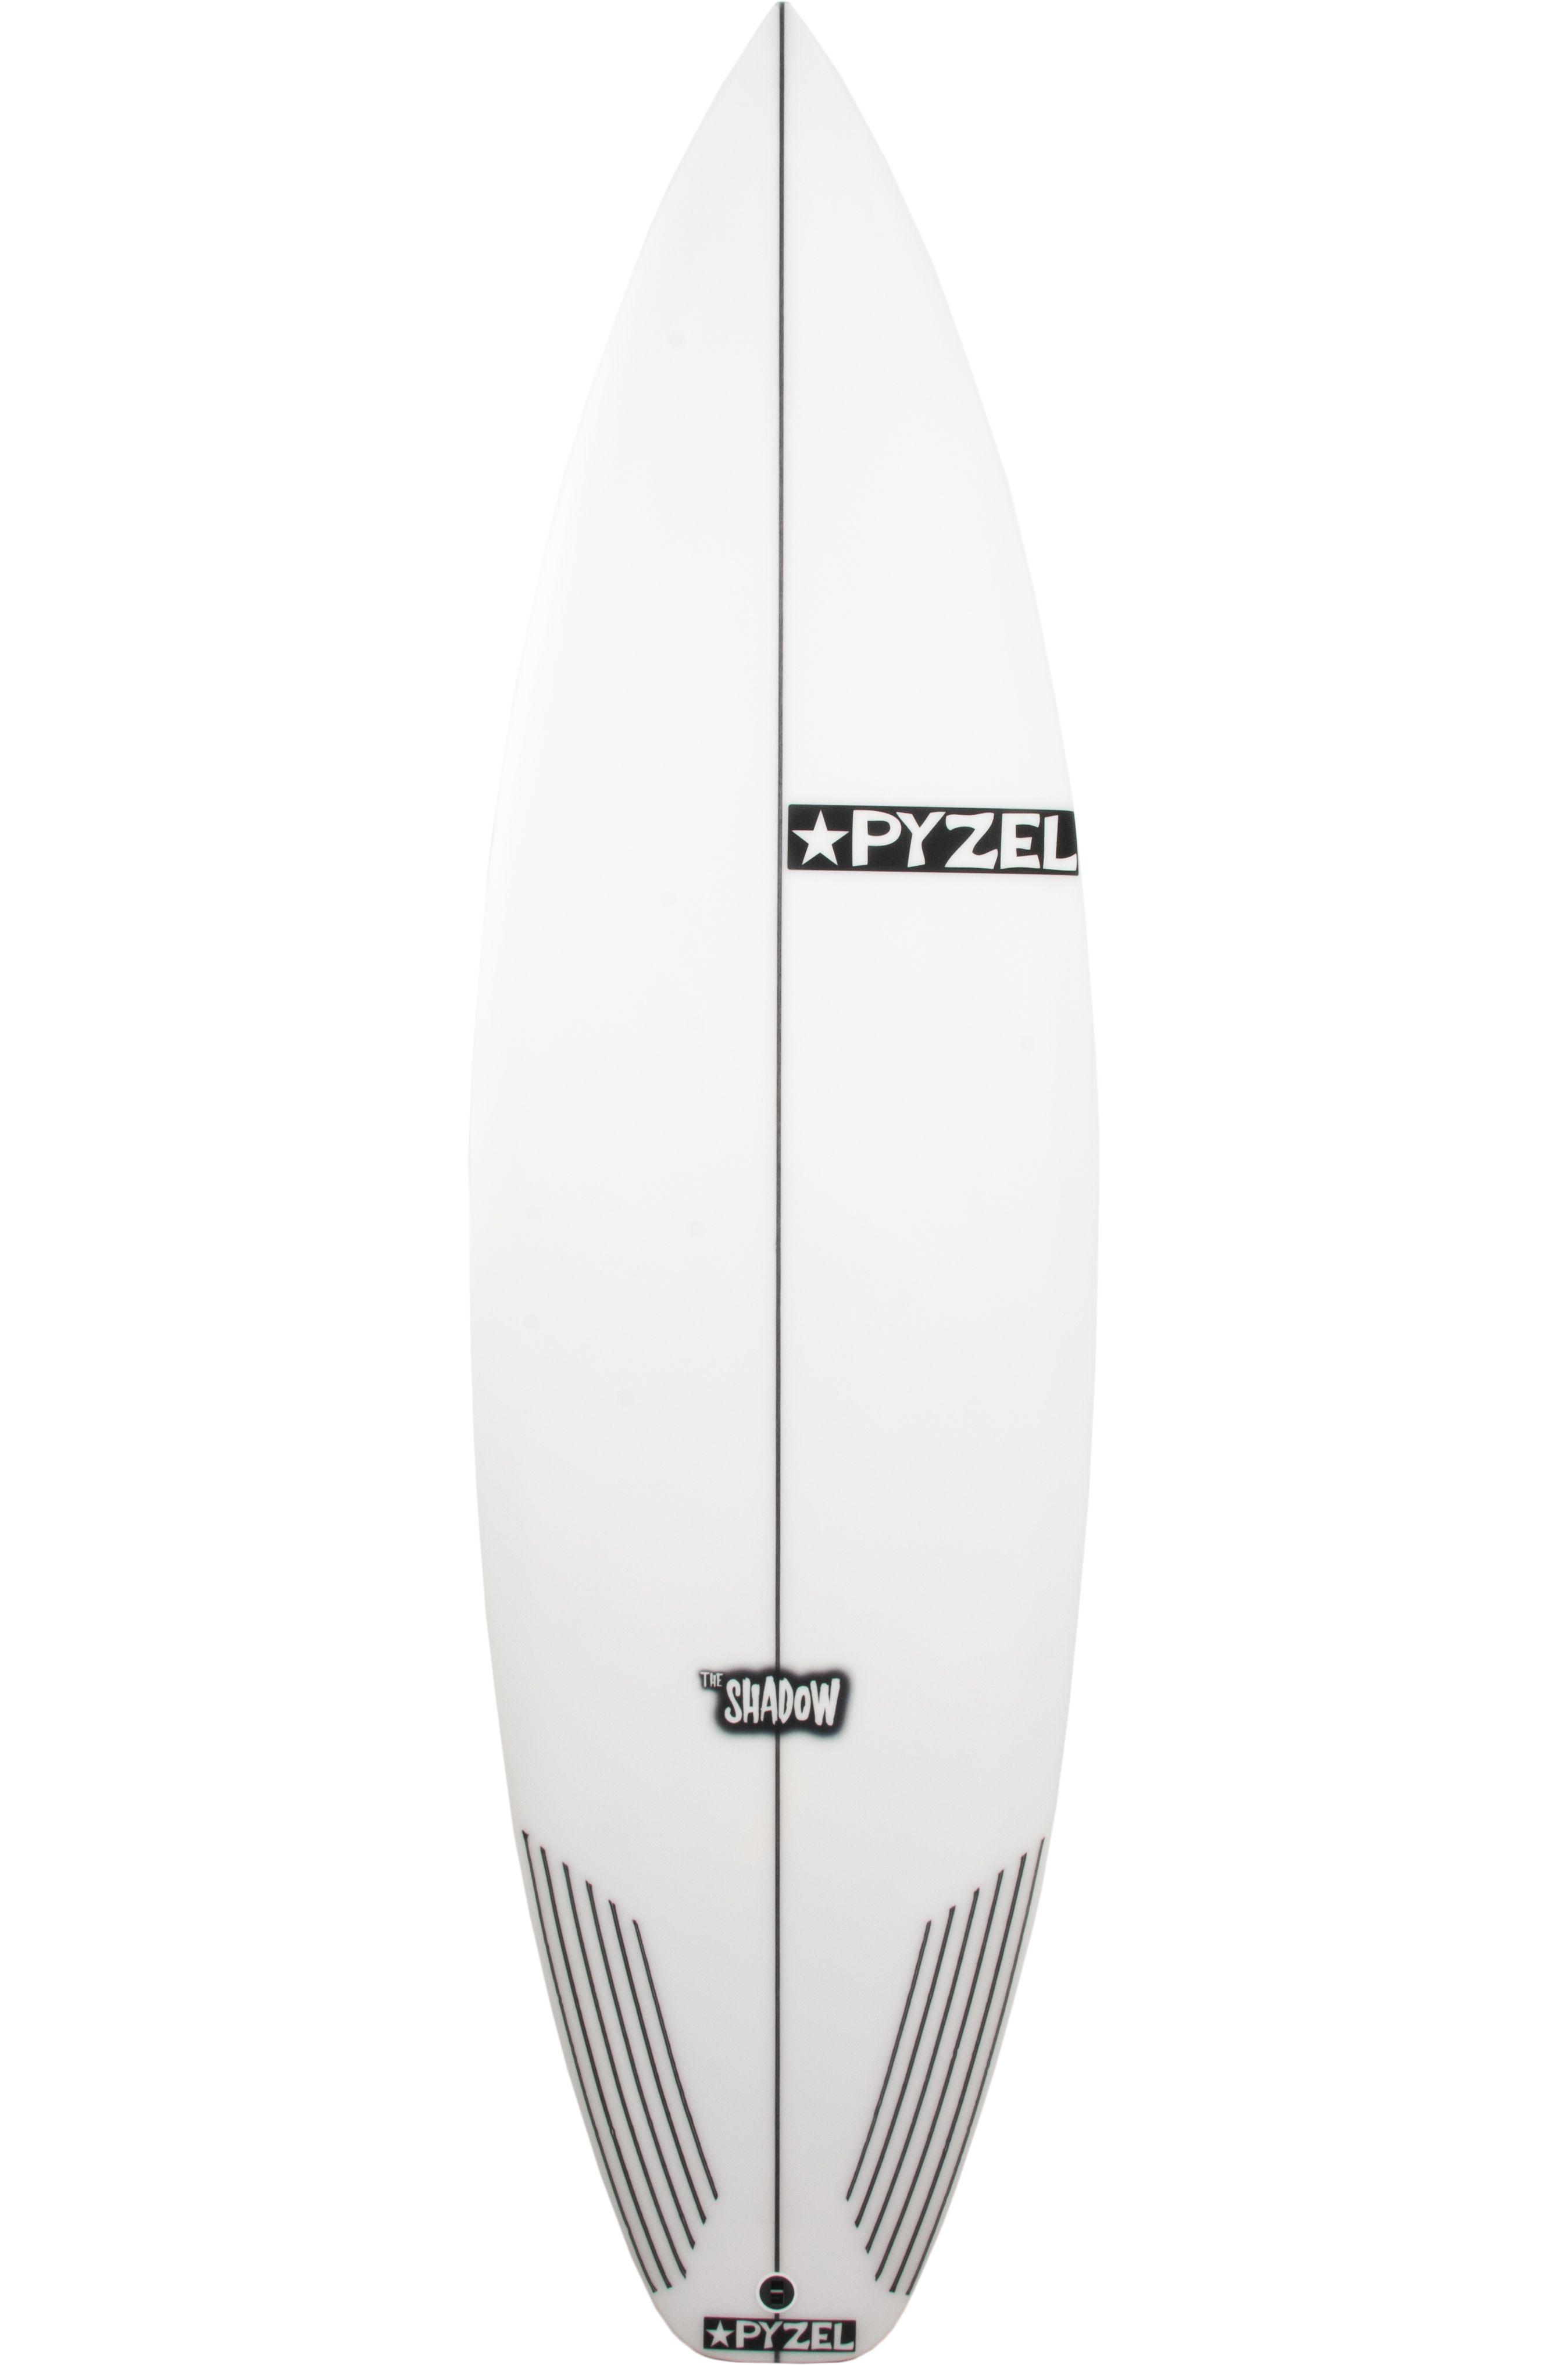 Prancha Surf Pyzel 5'11 SHADOW Squash Tail - White FCS II 5ft11